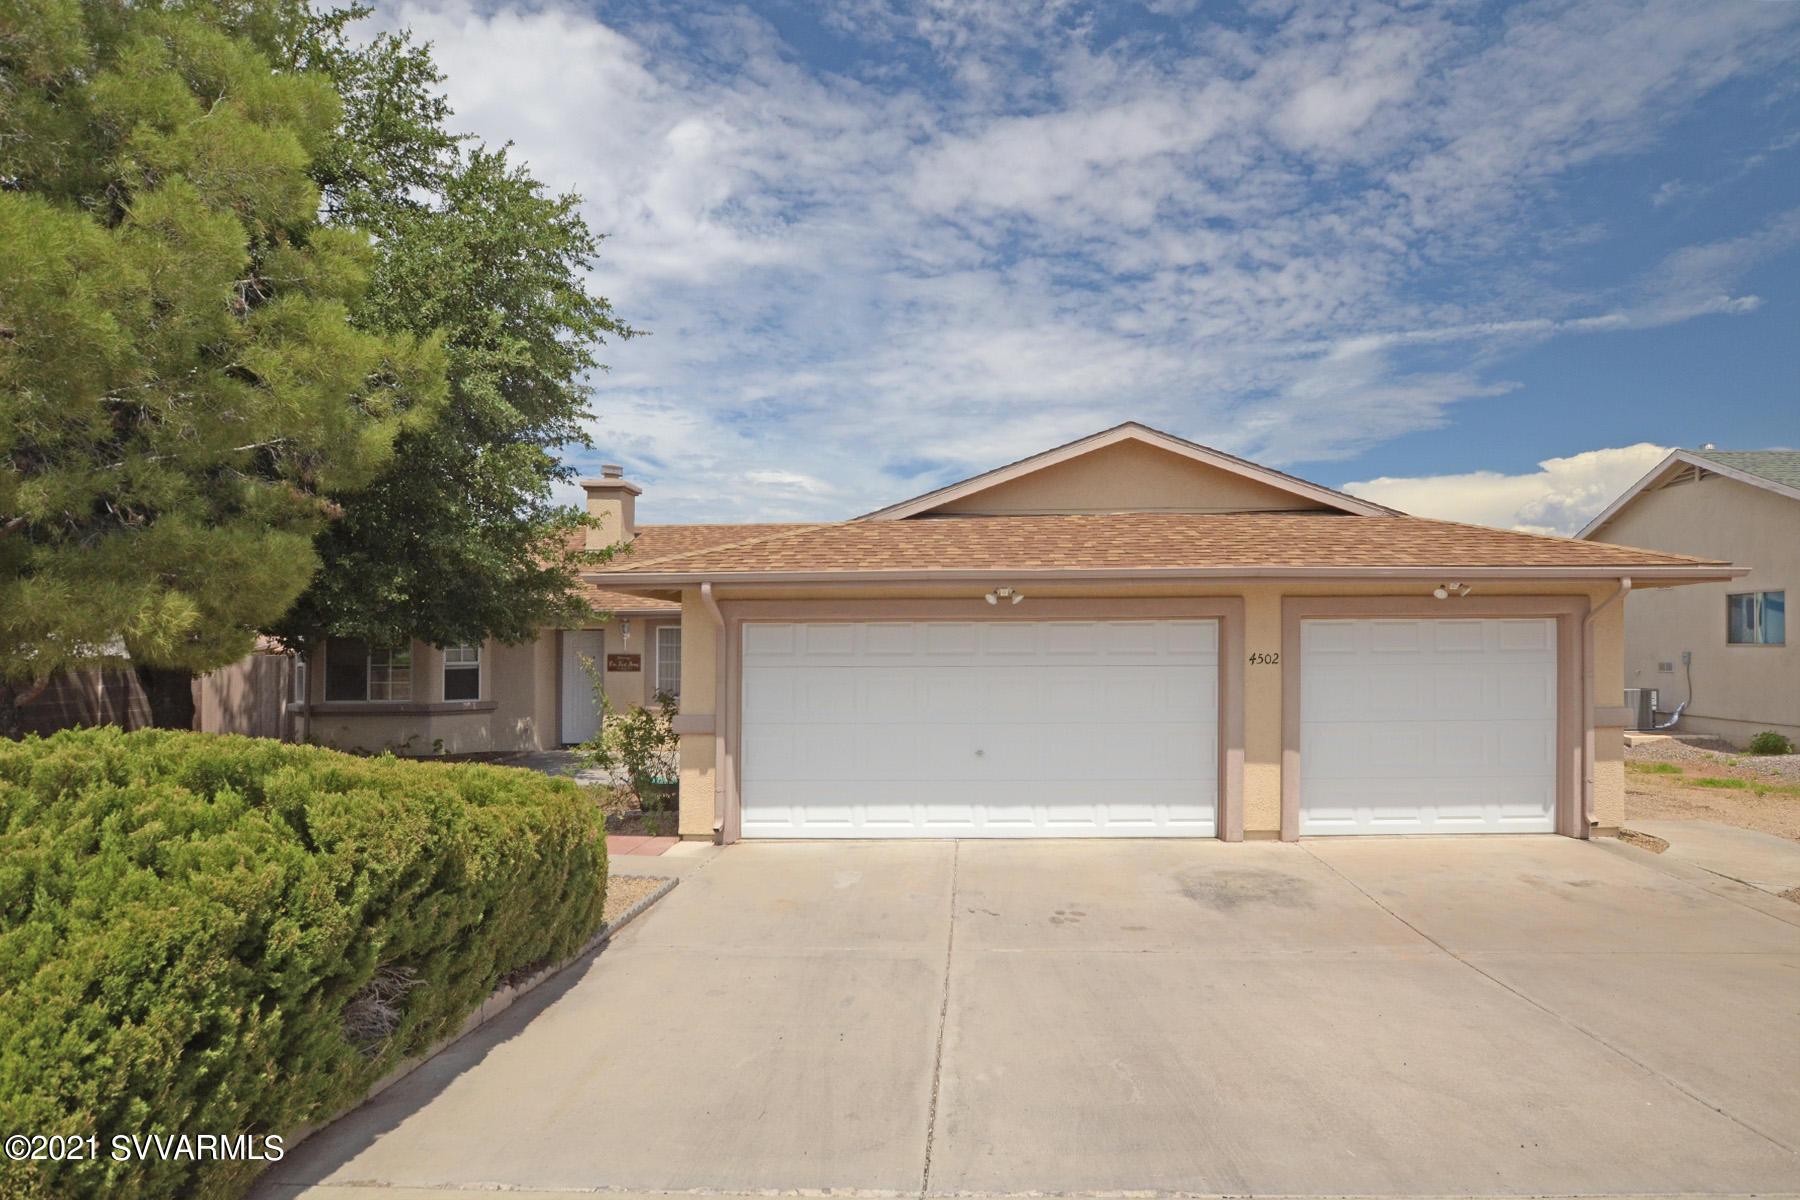 4502 Oxbow Tr Cottonwood, AZ 86326